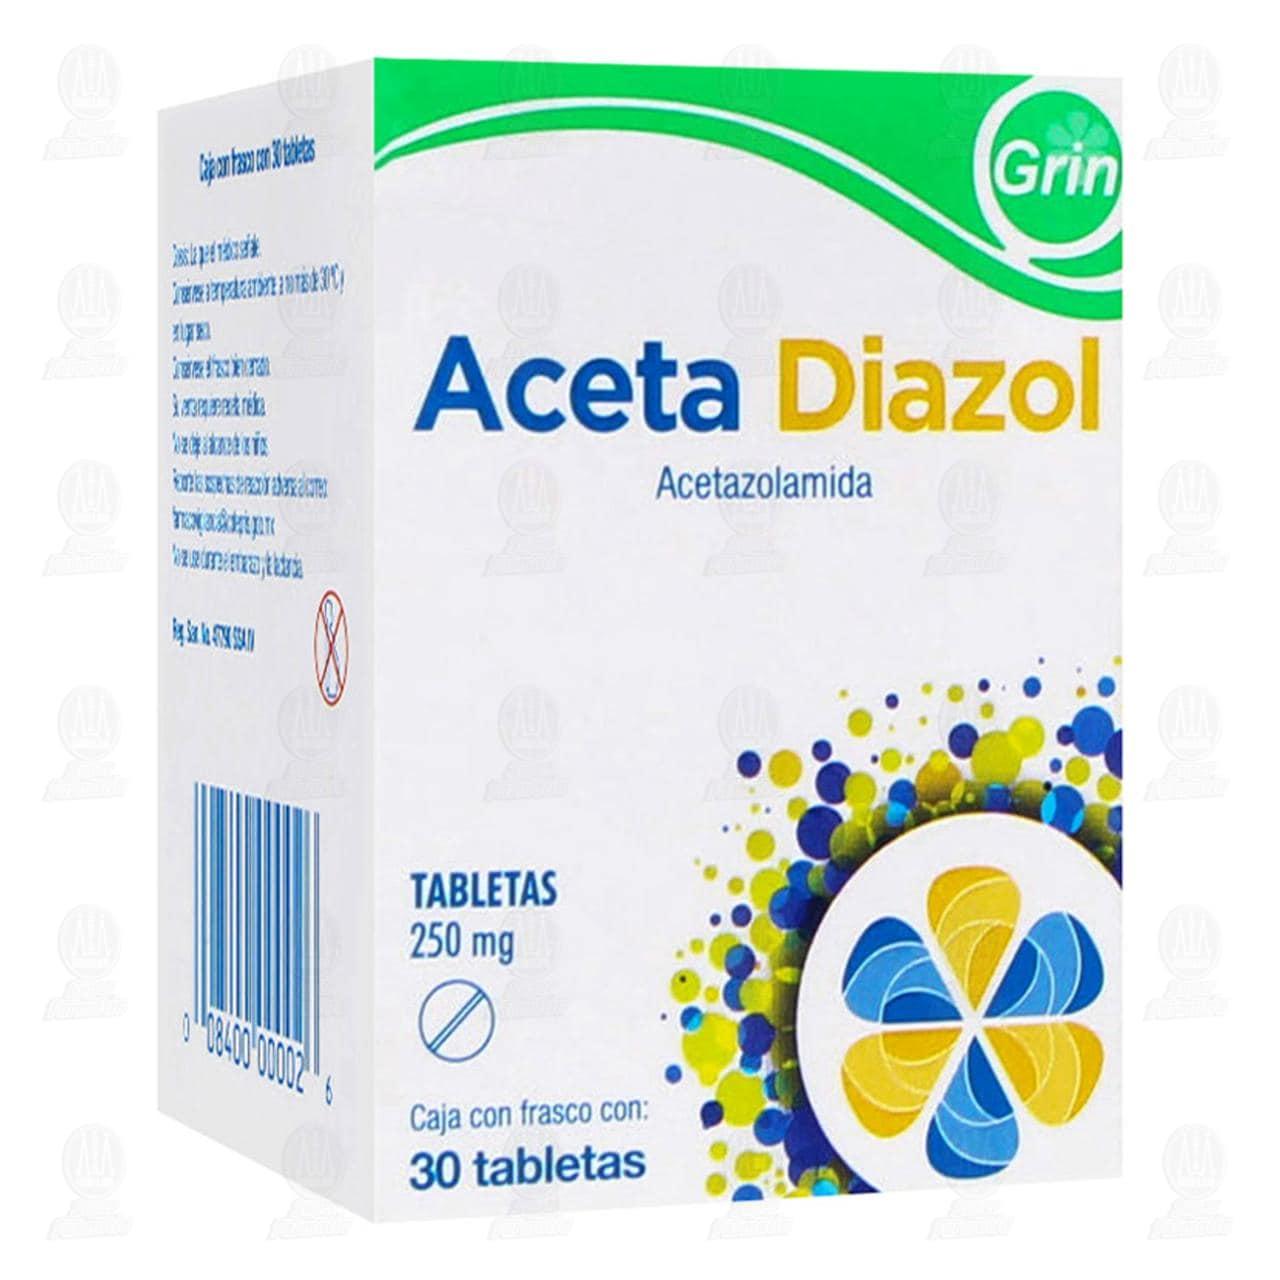 Aceta Diazol 250mg 30 Tabletas